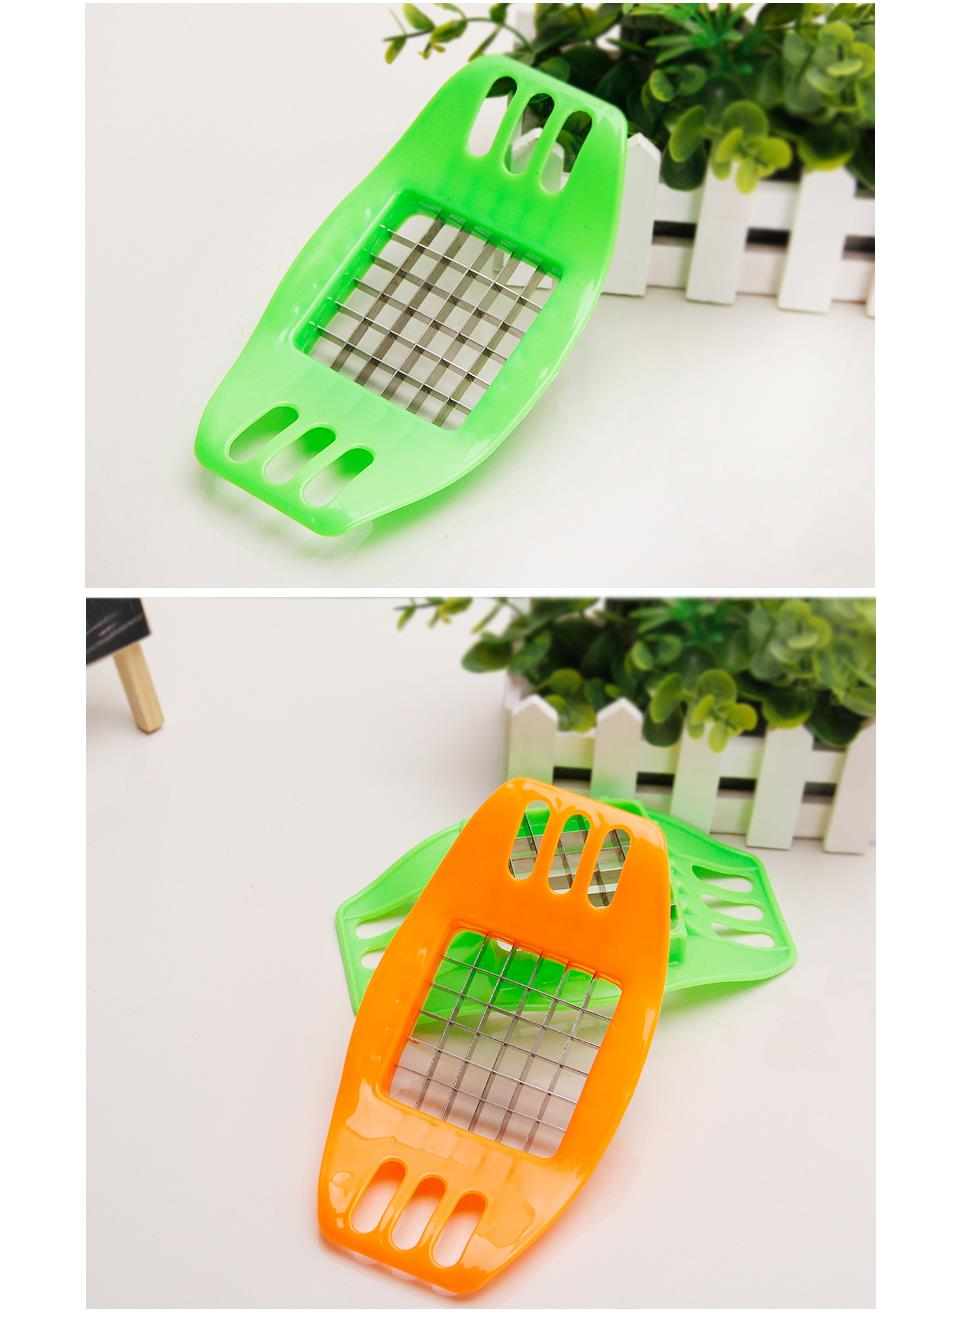 Stainless Steel Vegetable and Potato Slicer